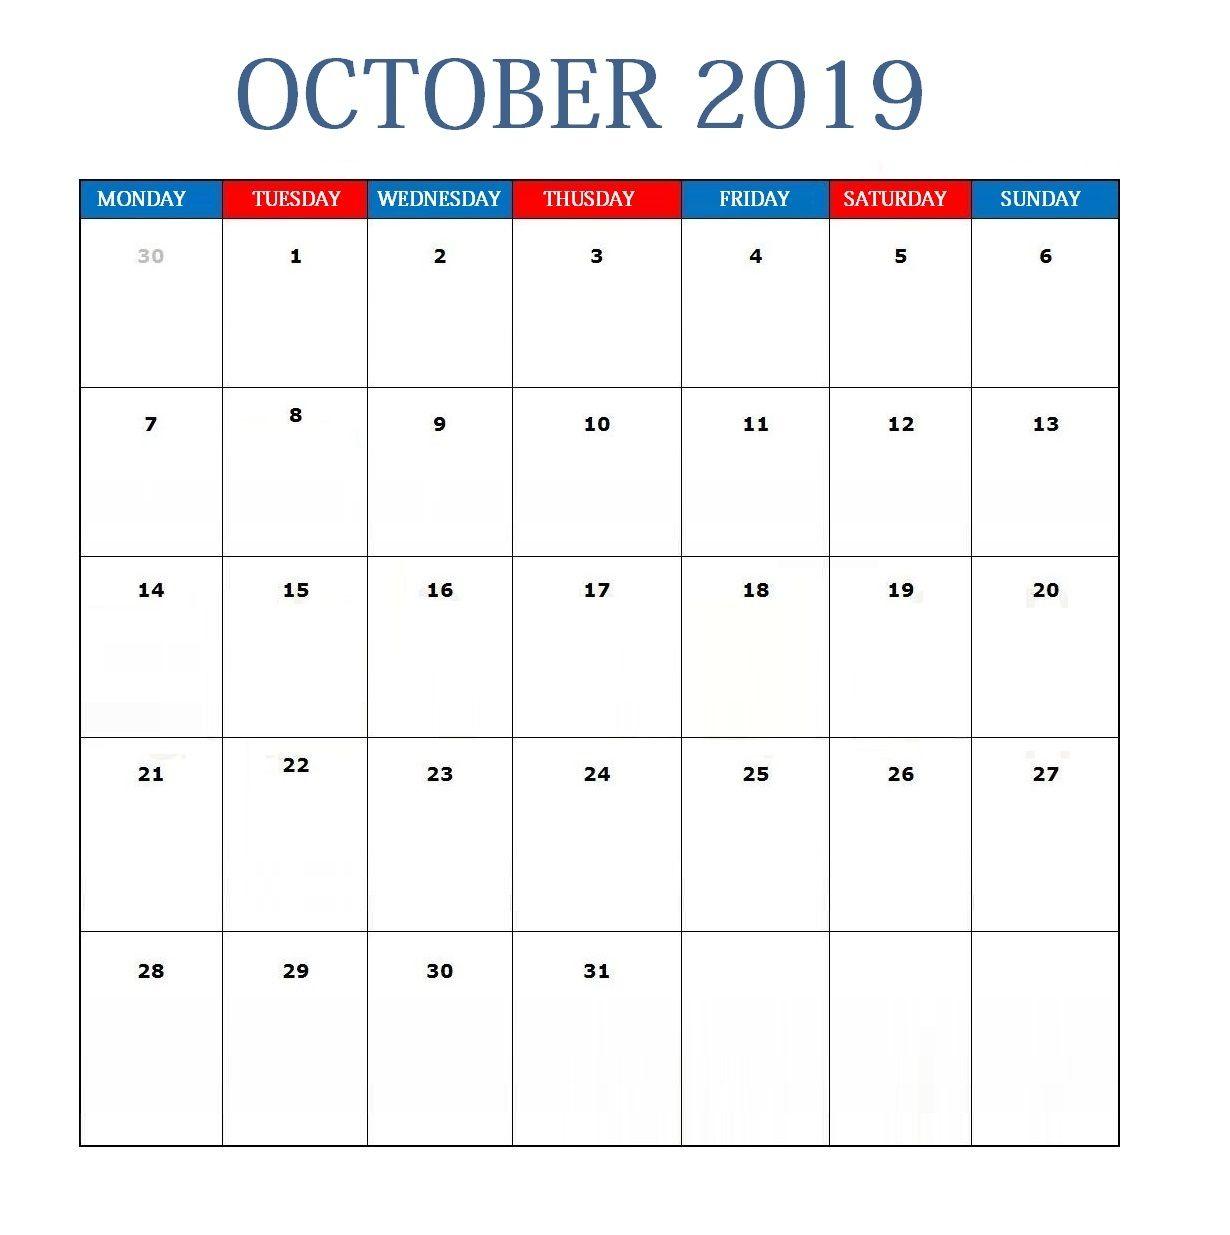 Blank October 2019 Calendar Template October 2019 Calendar